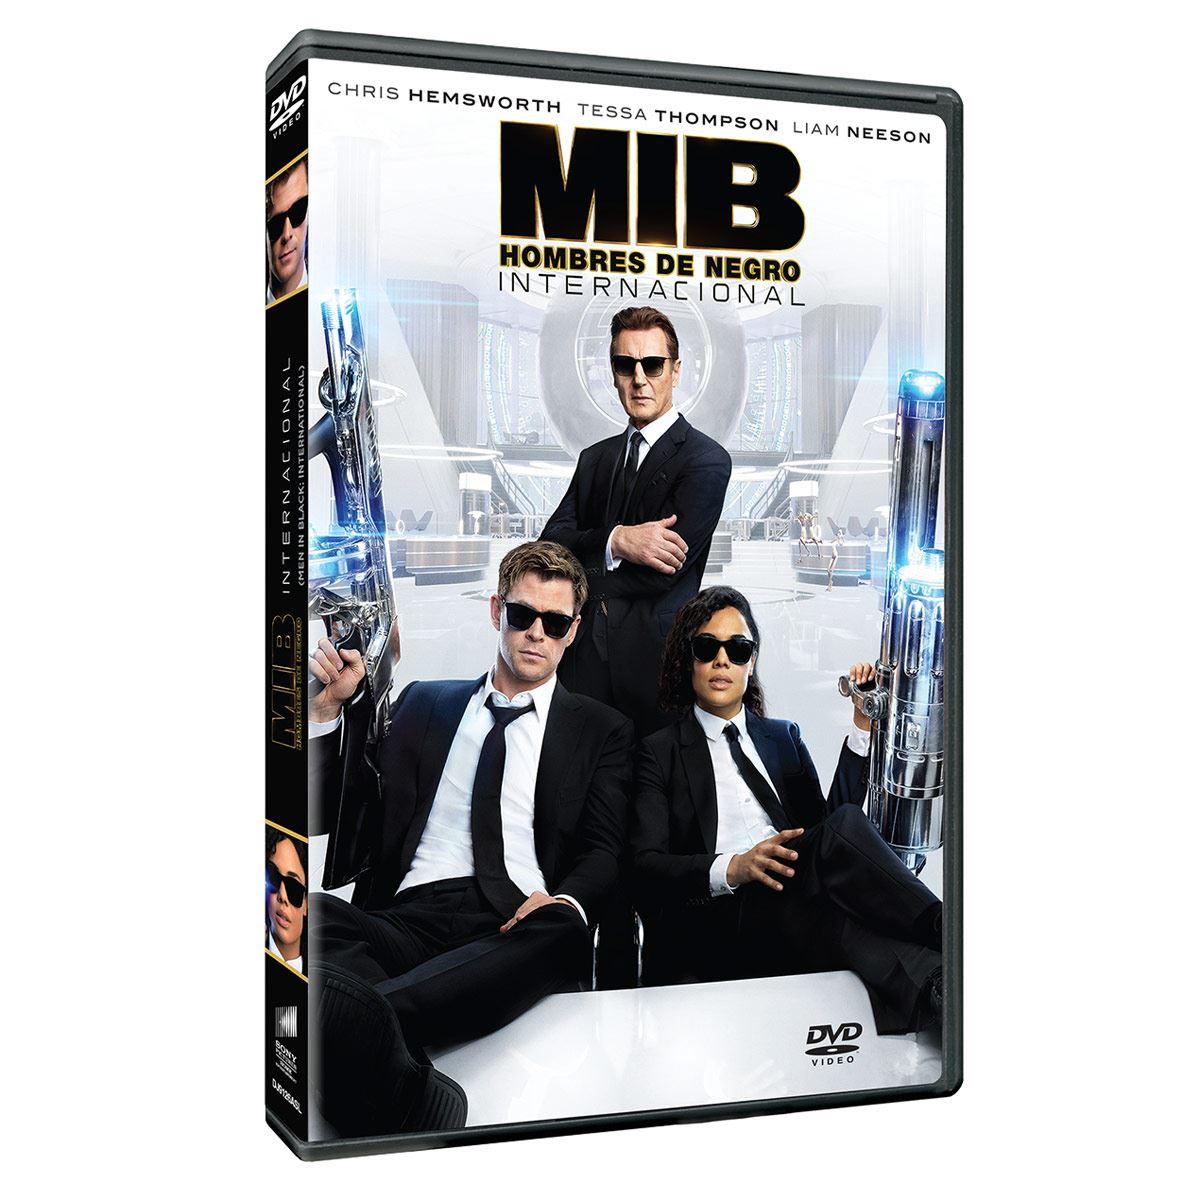 DVD Hombres de Negro Internacional